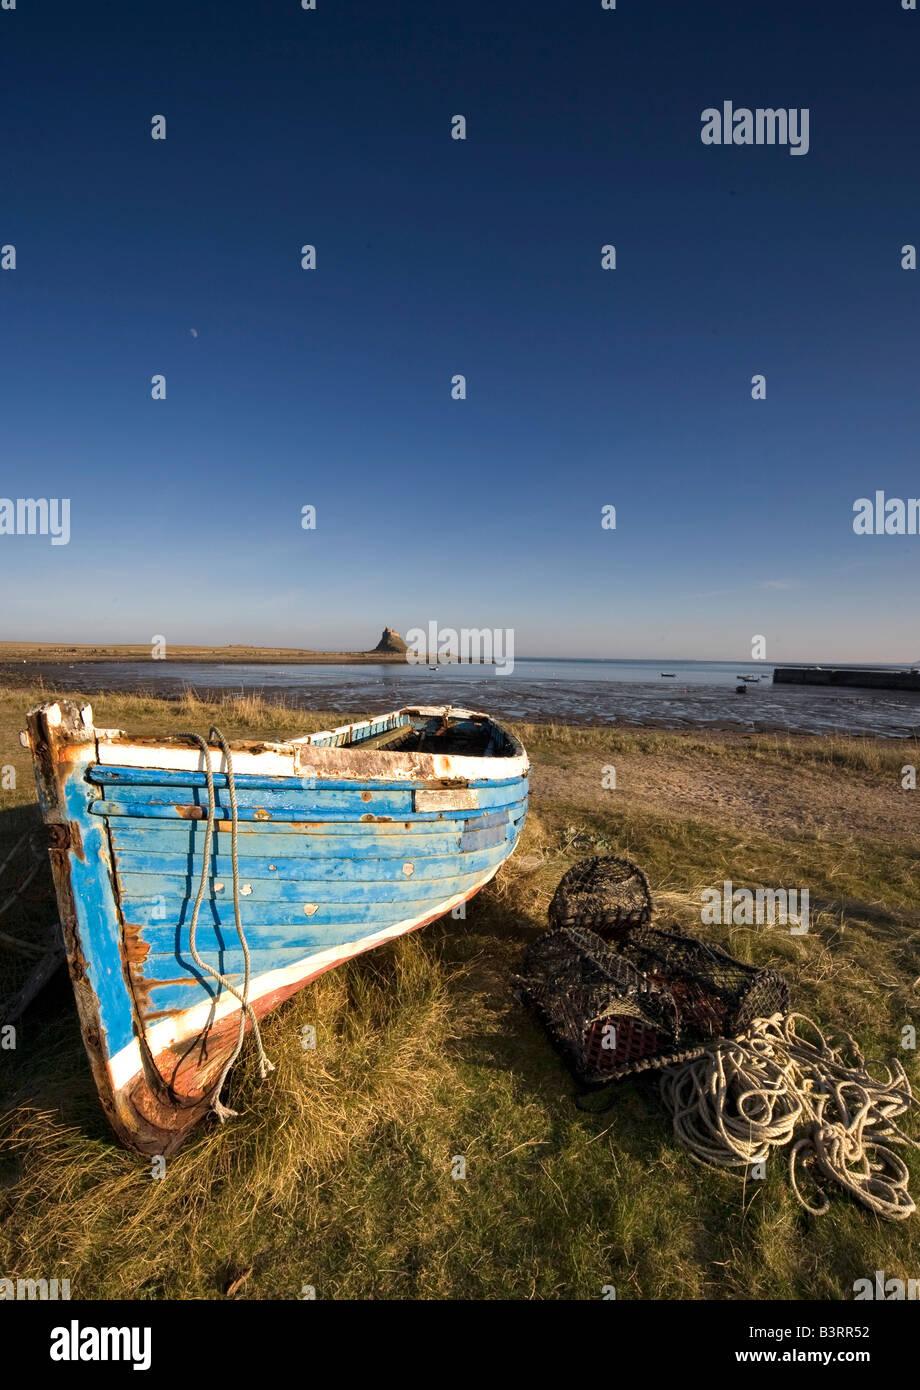 Weathered fishing boat on shore, Holy Island, Bewick, England - Stock Image